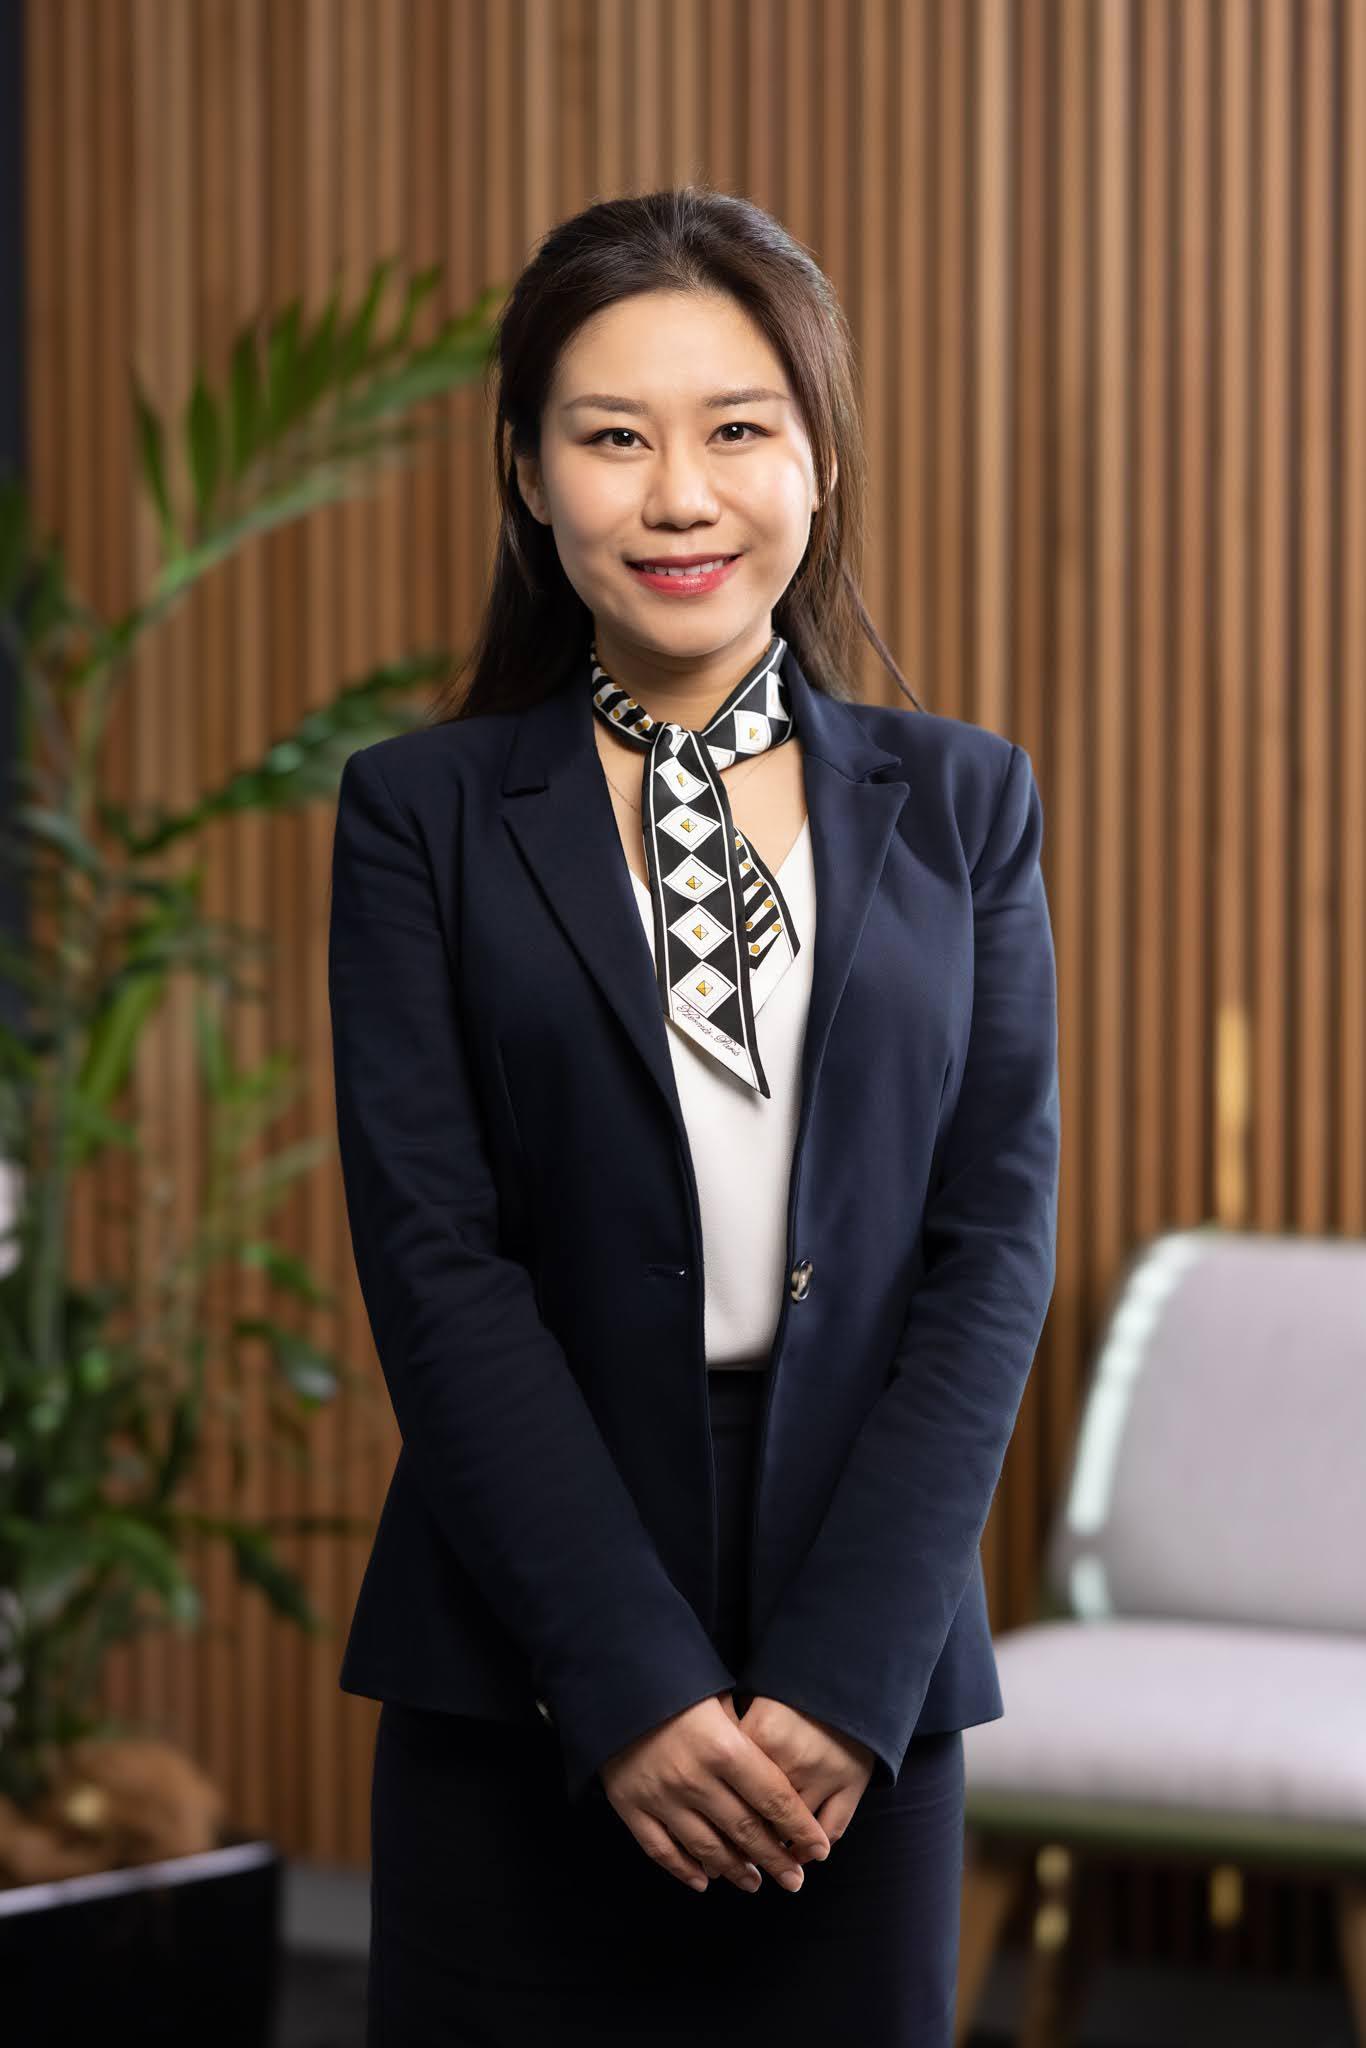 Ranee Wang